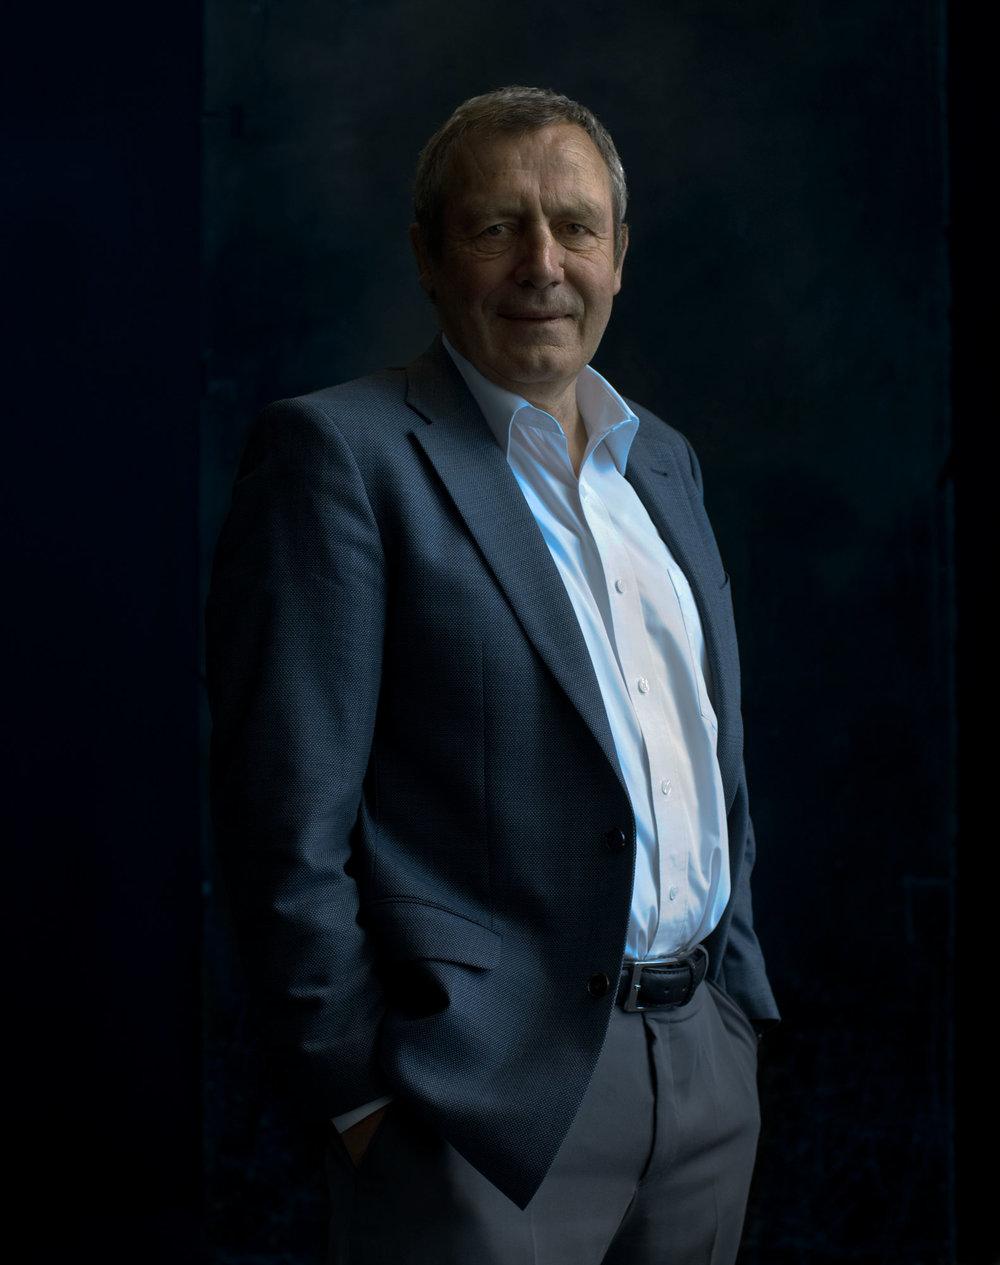 K.O. Pedersen